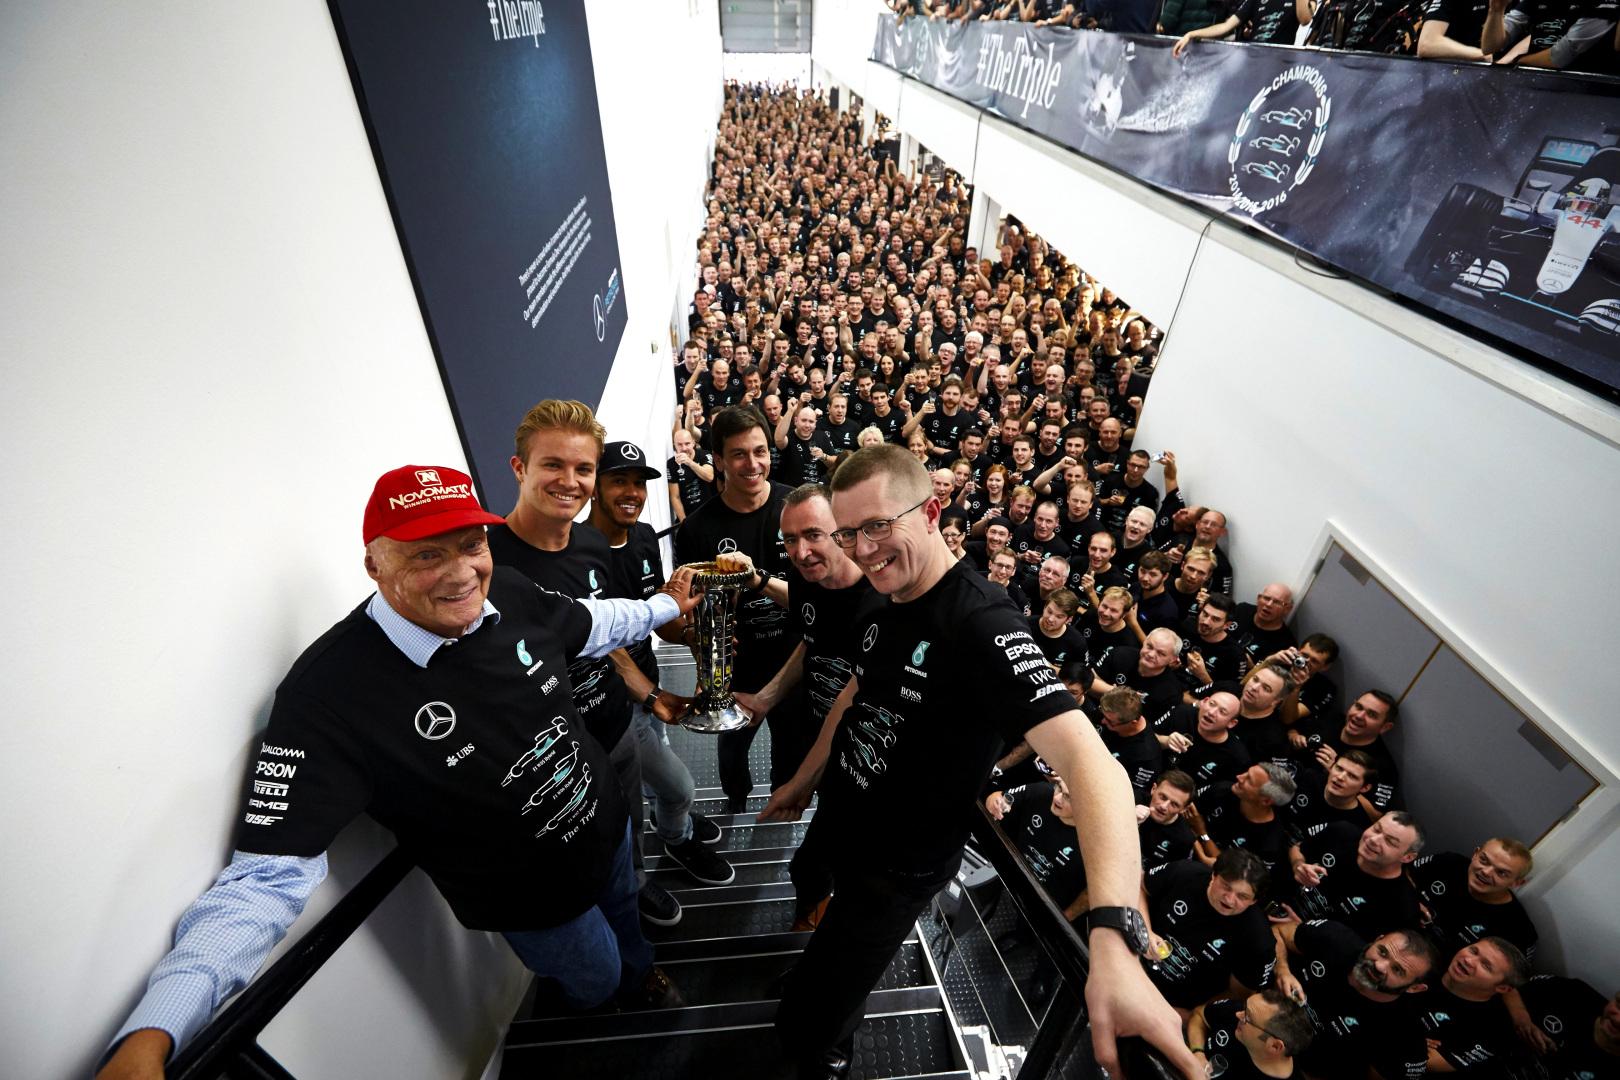 Mercedes 2016 F1 title celebration